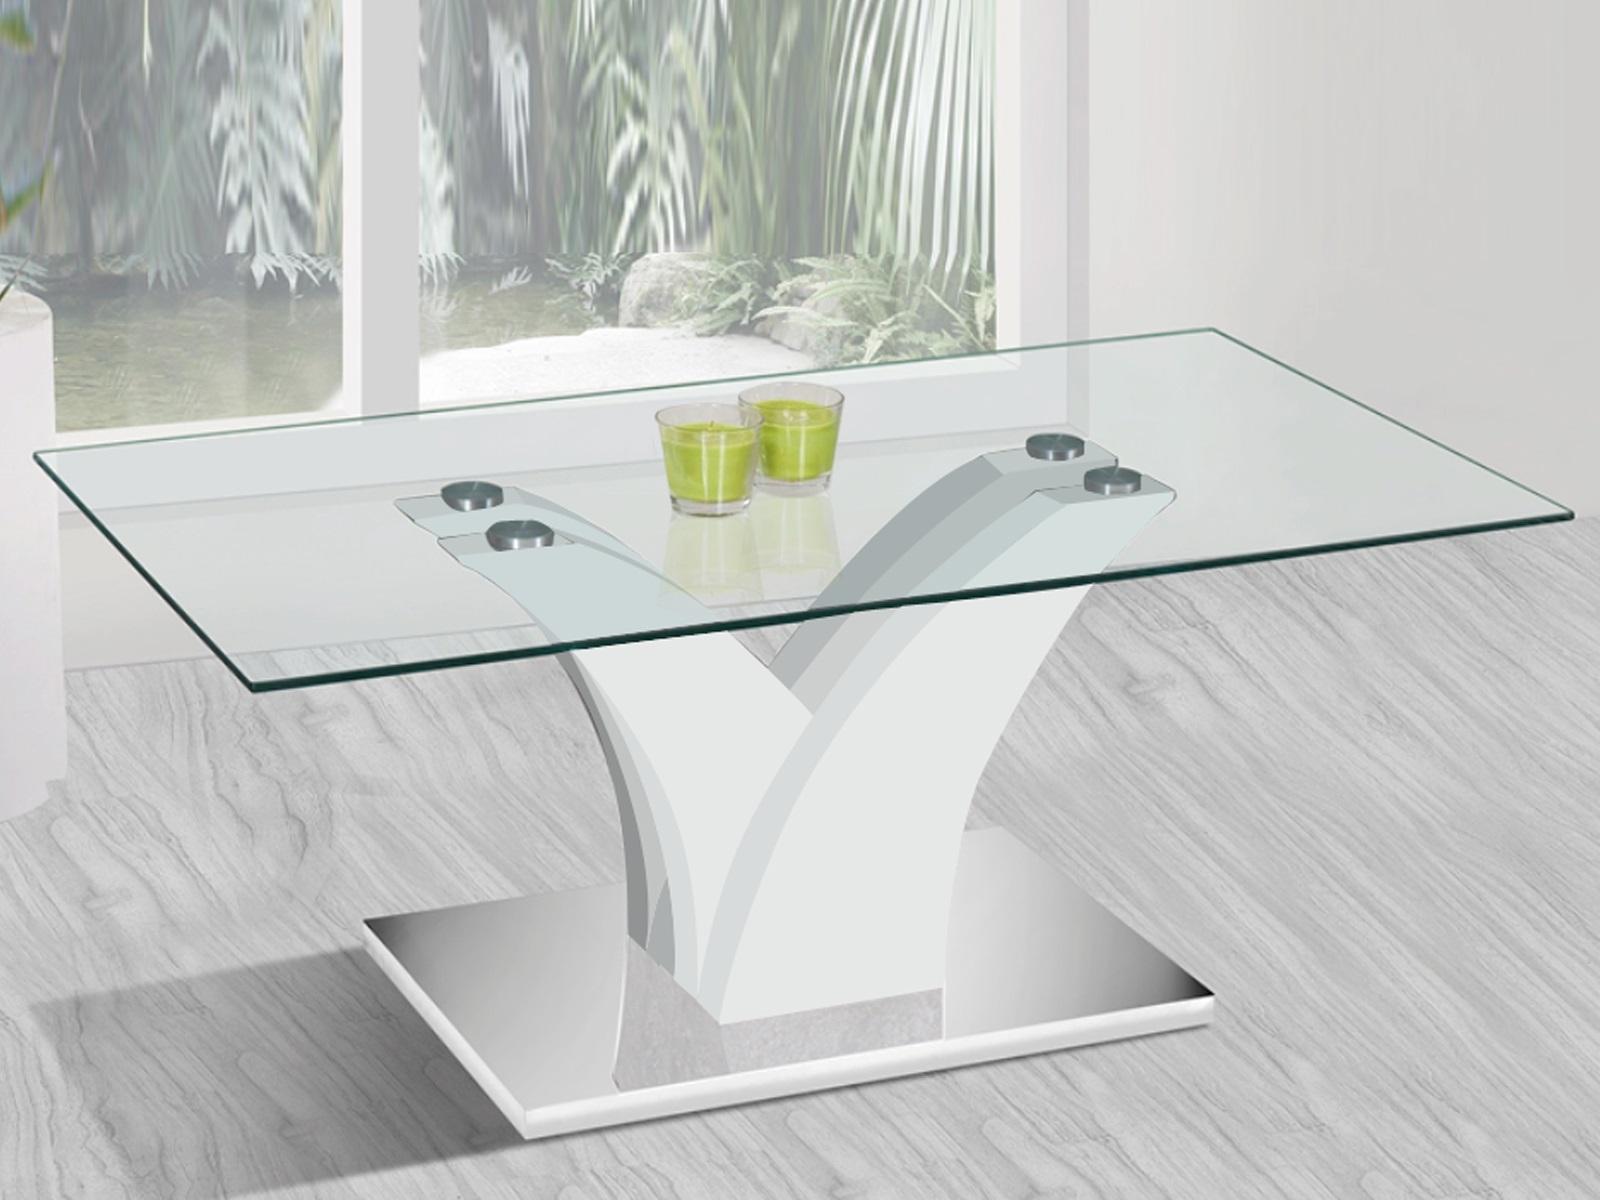 Glazen Tafel Ikea : Glazen salontafel ikea. top latest my make up corner jerka s view